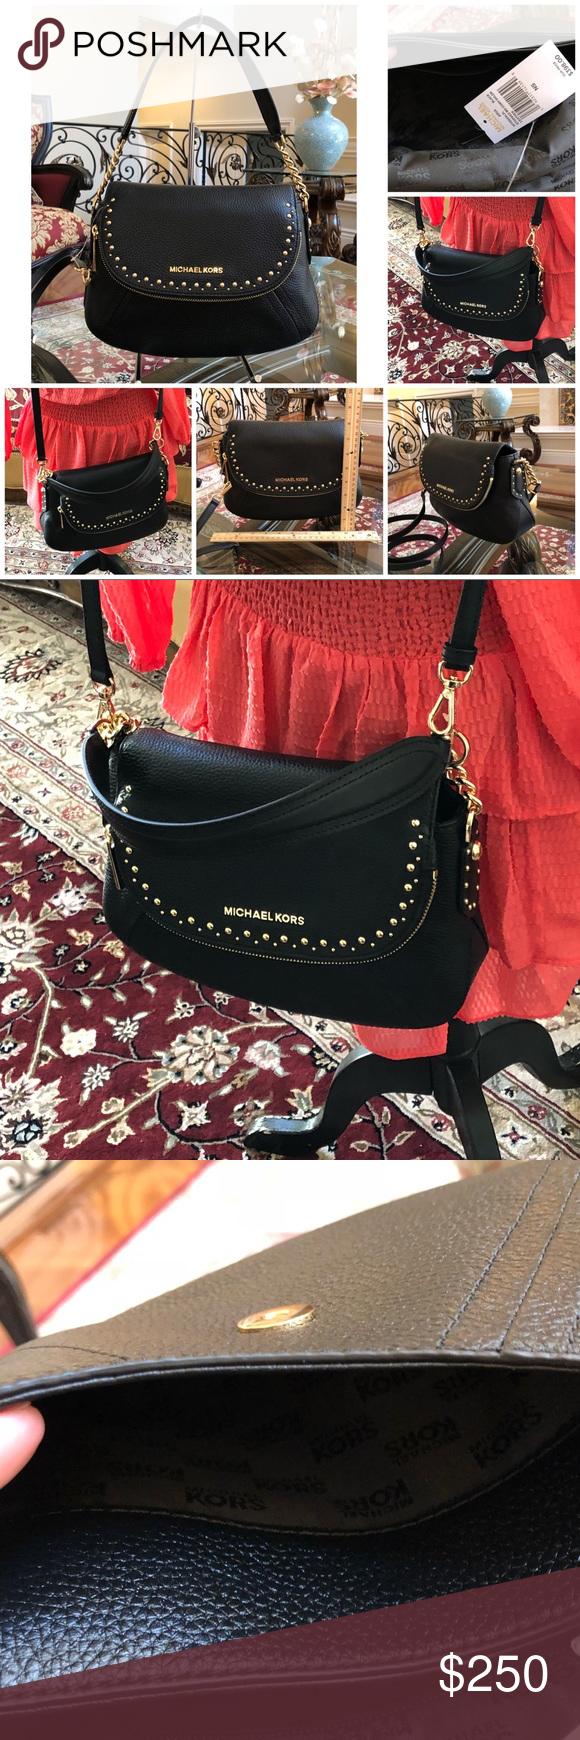 636444c5bd64 NWT Michael Kors studded Aria MD Conv Handbag Guaranteed Authentic NWT  MICHAEL KORS STUDDED MD CONV